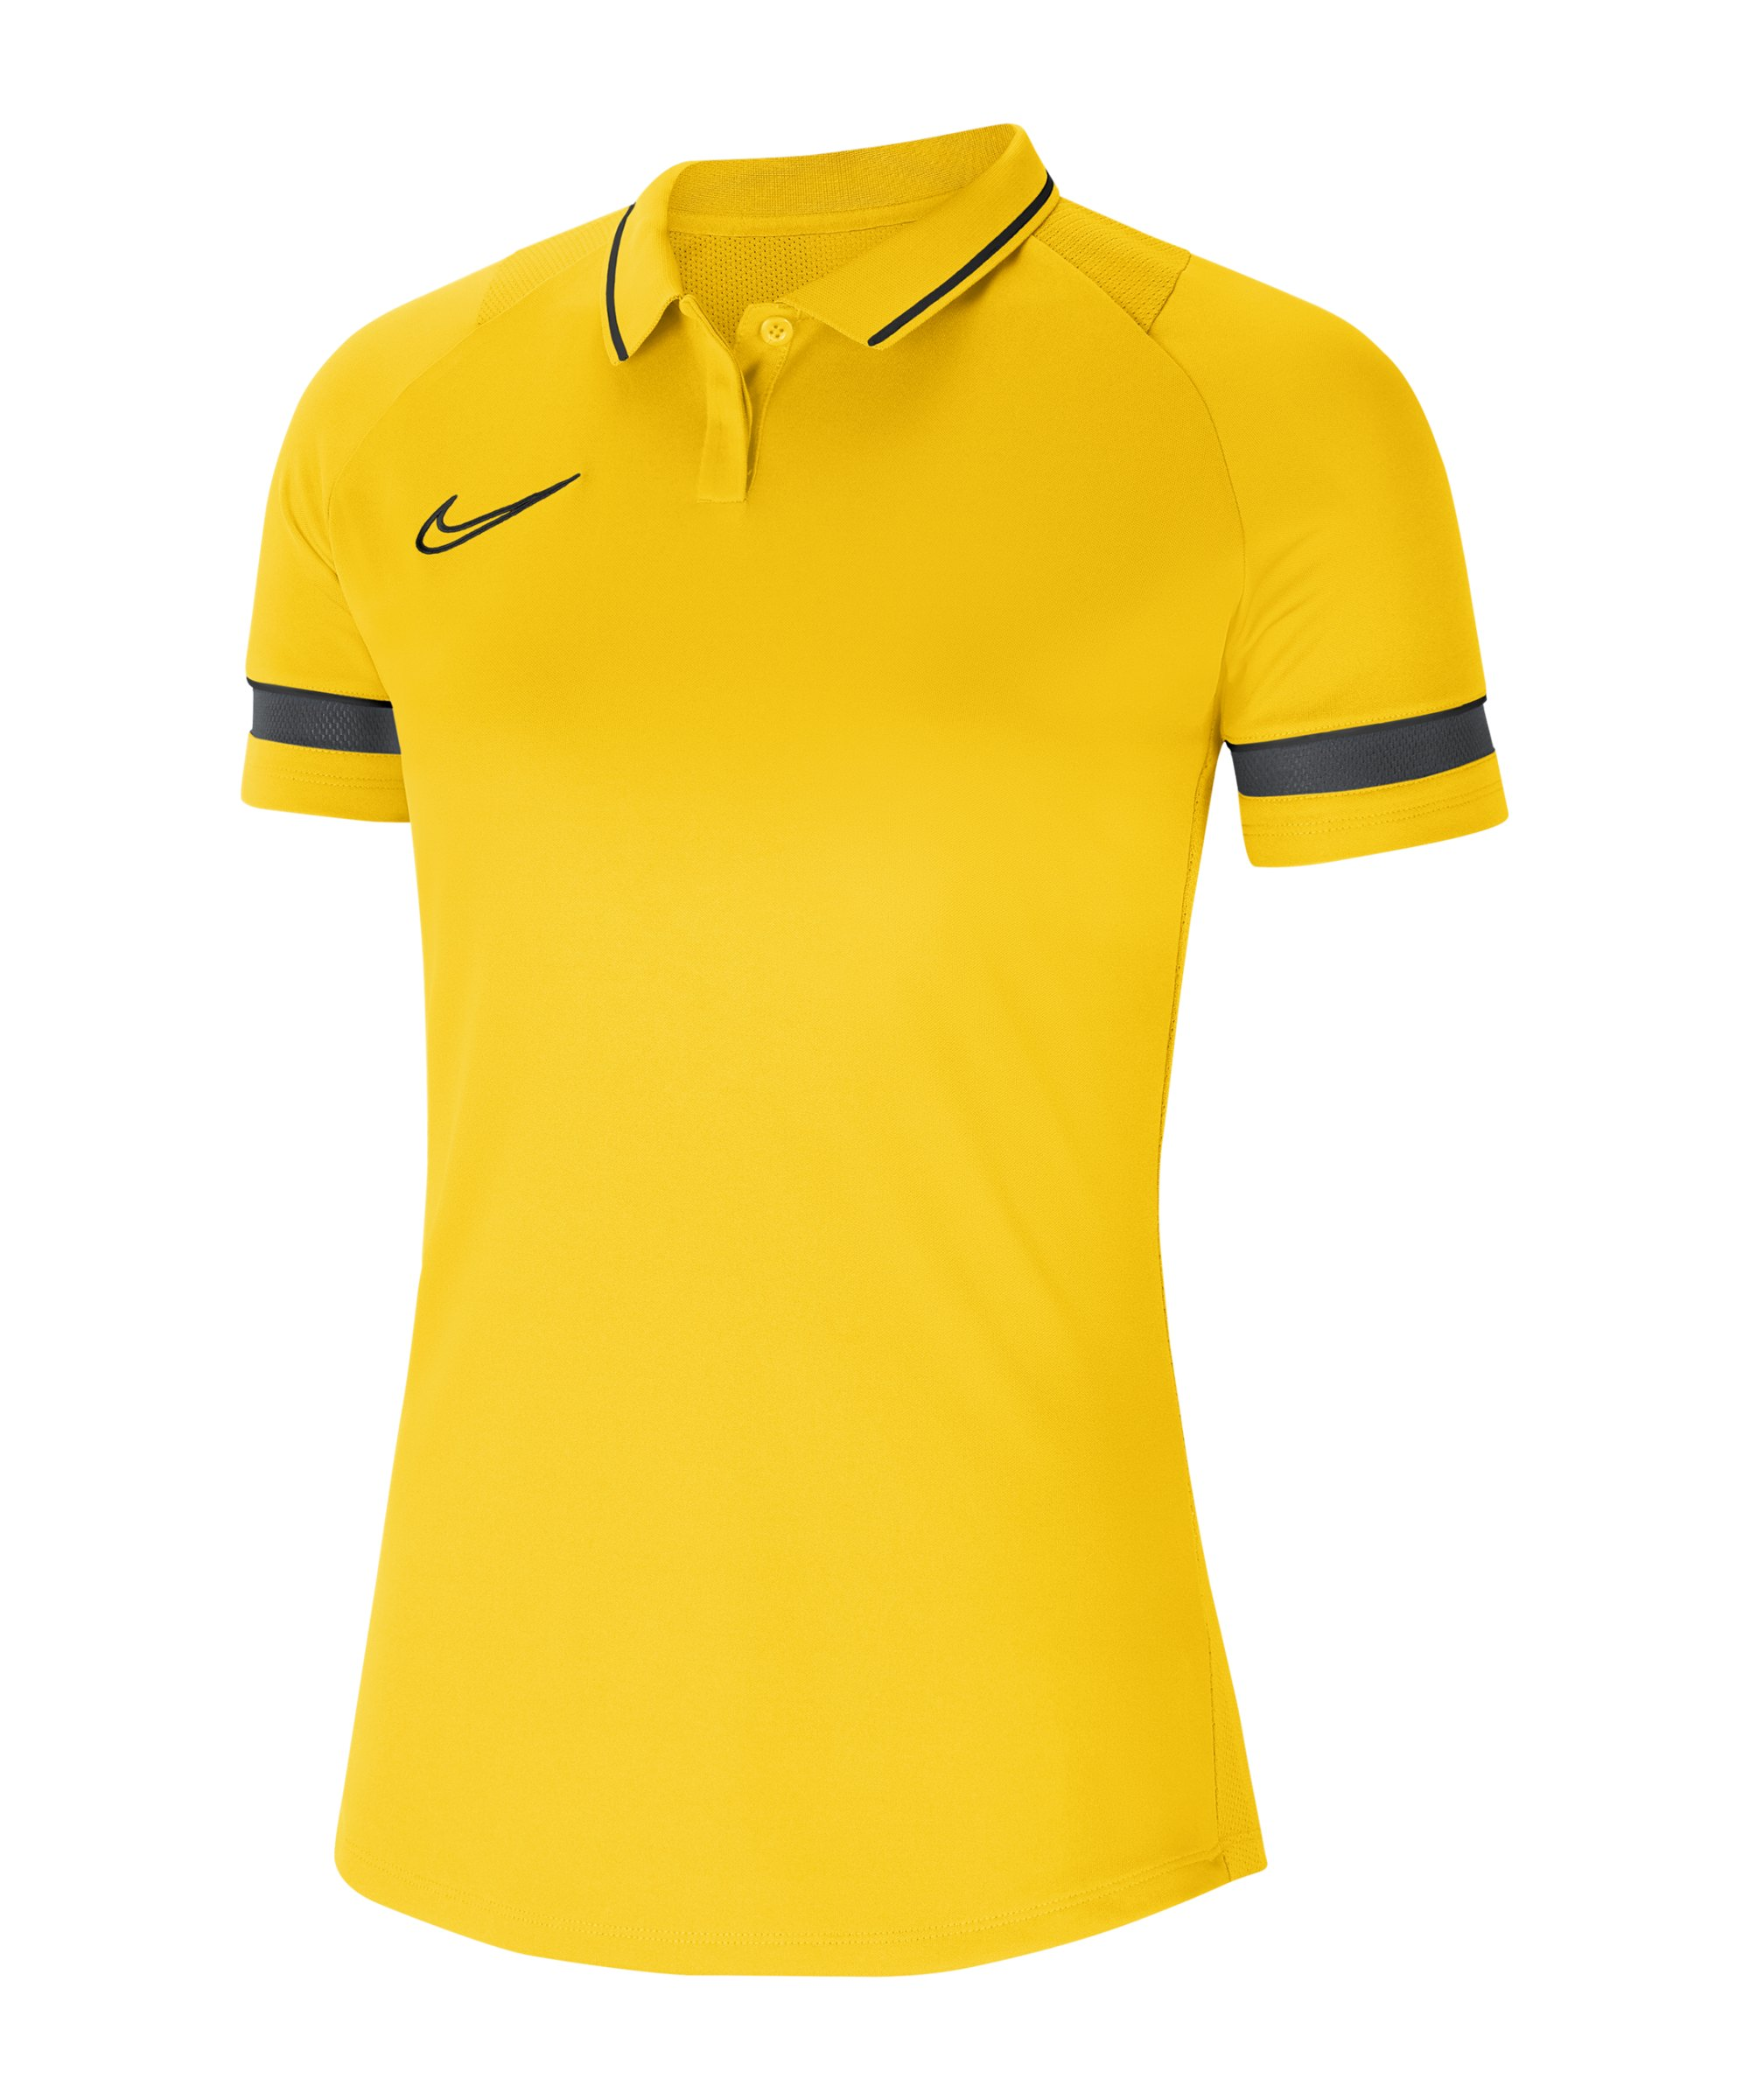 Nike Academy 21 Poloshirt Damen Gelb Schwarz F719 - gelb